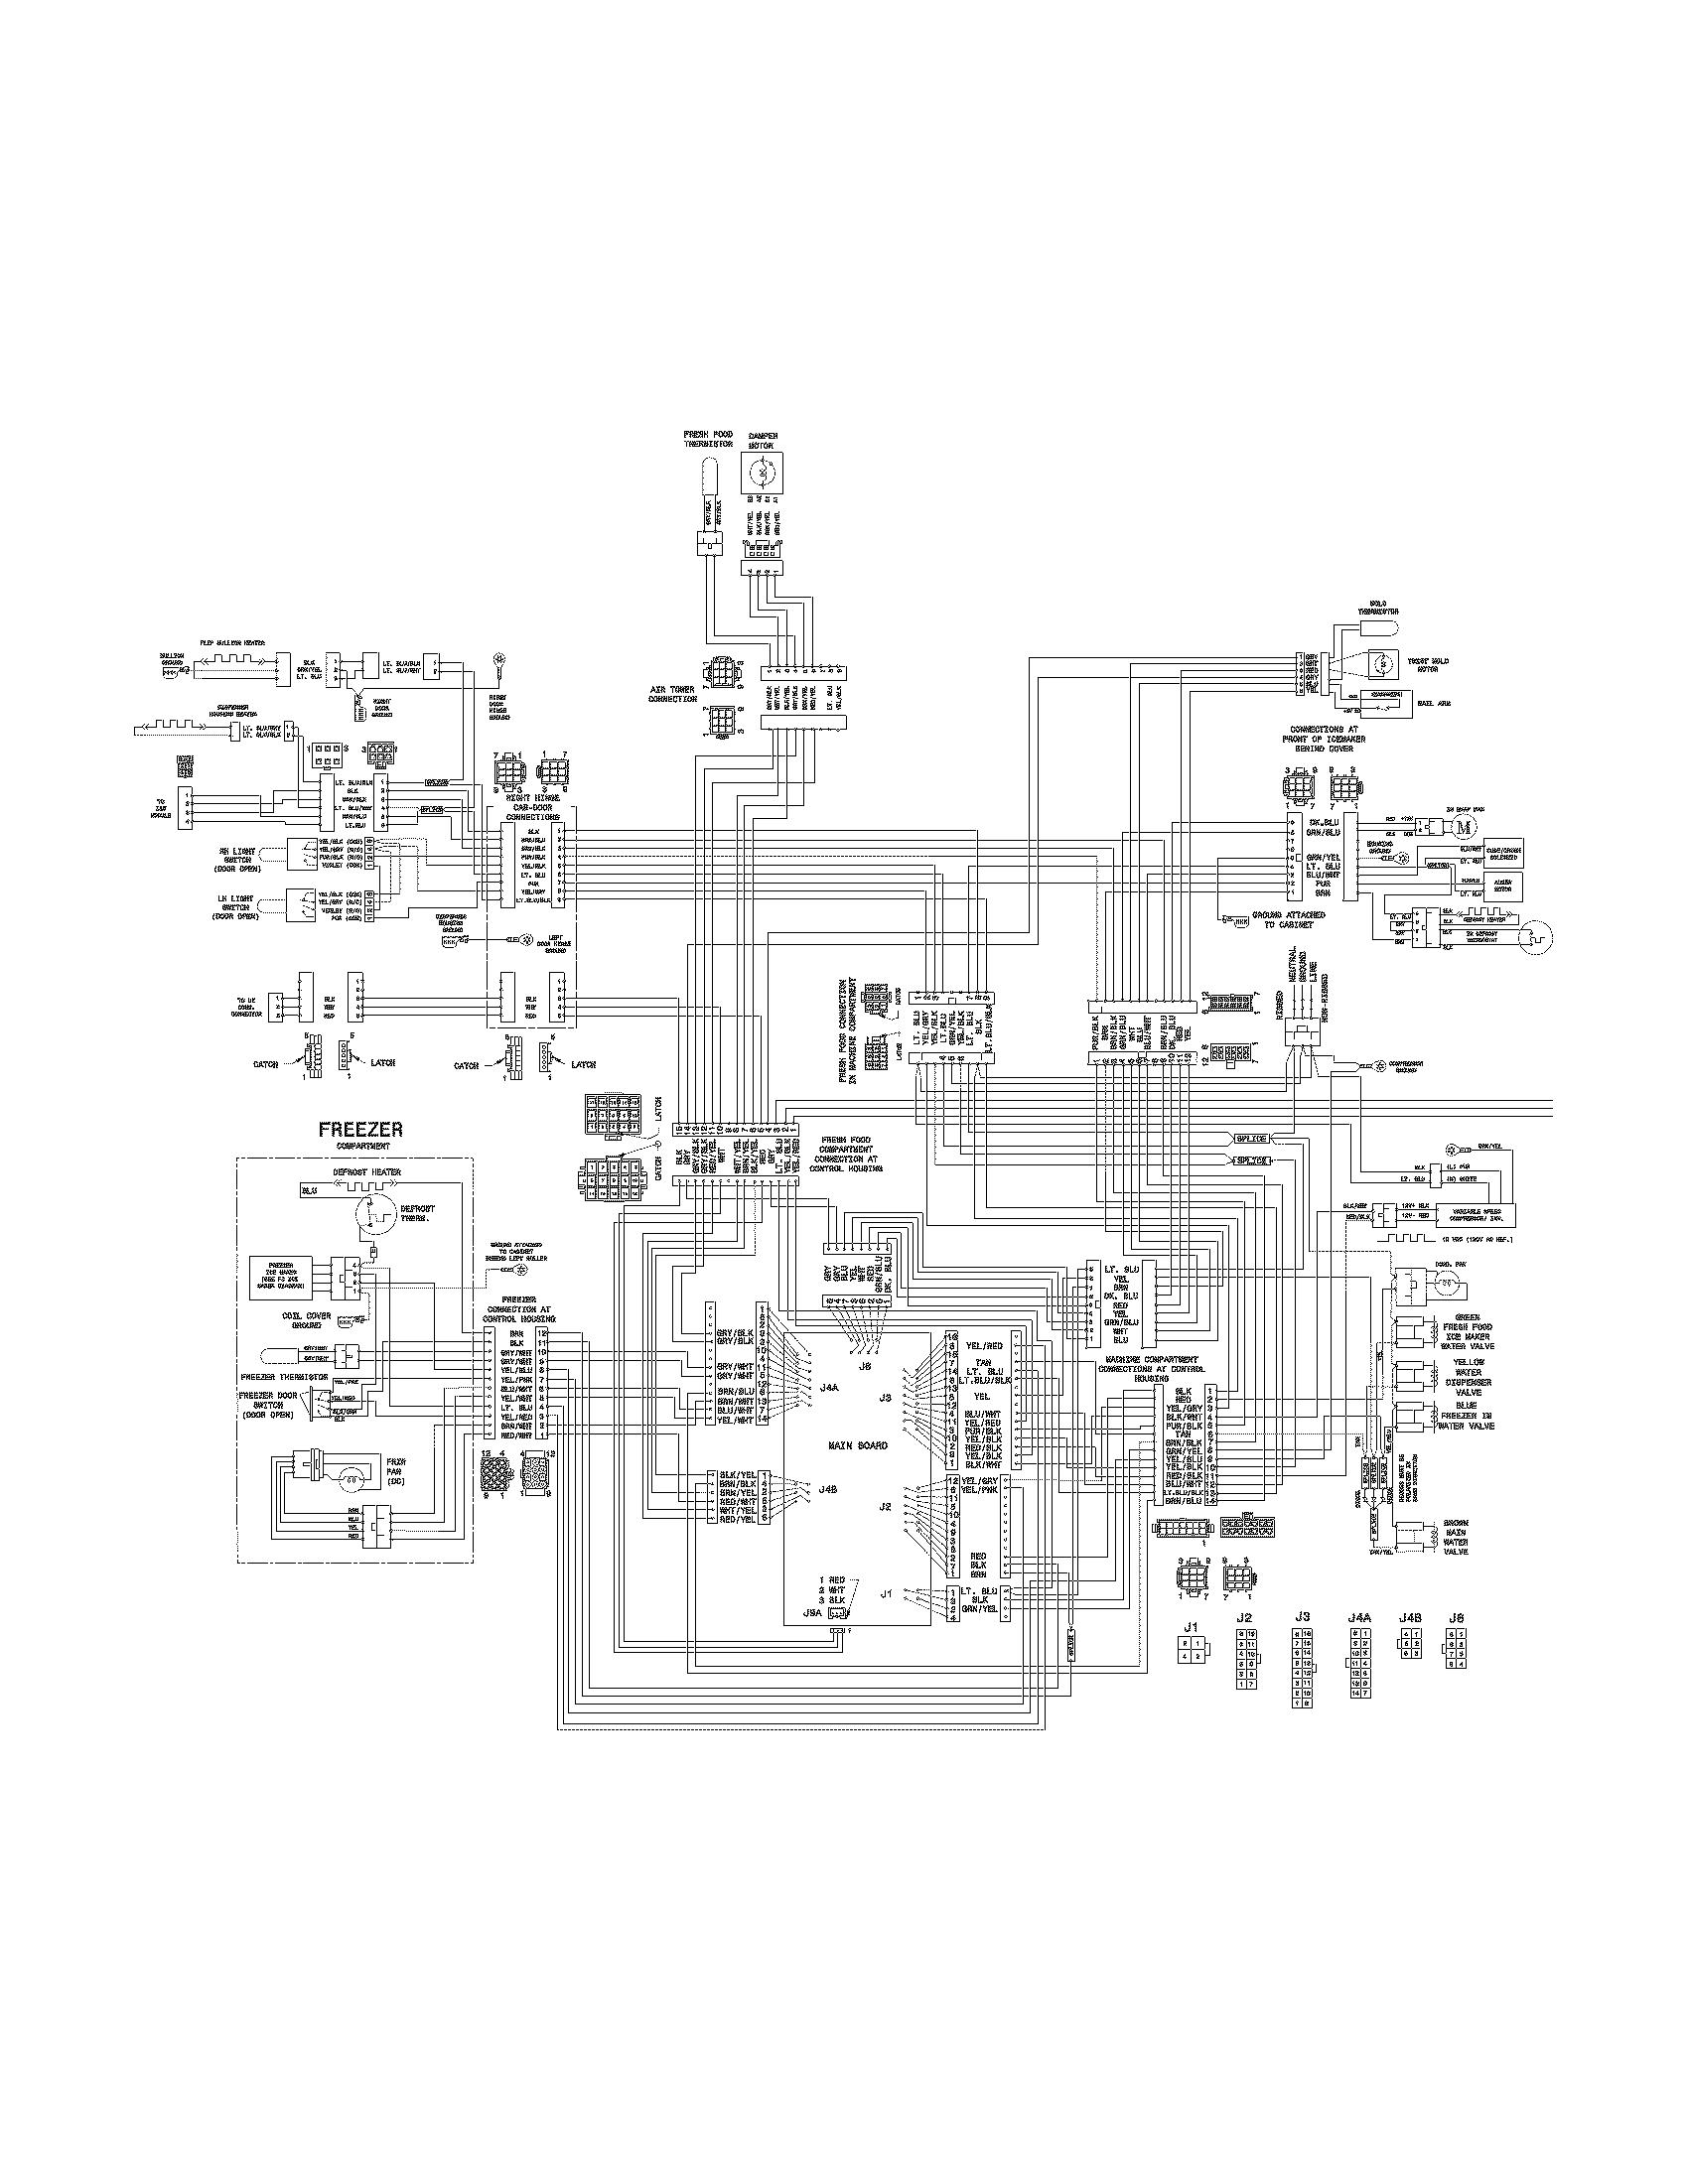 Wiring Diagram For Whirlpool Dehumidifier Damper Wiring